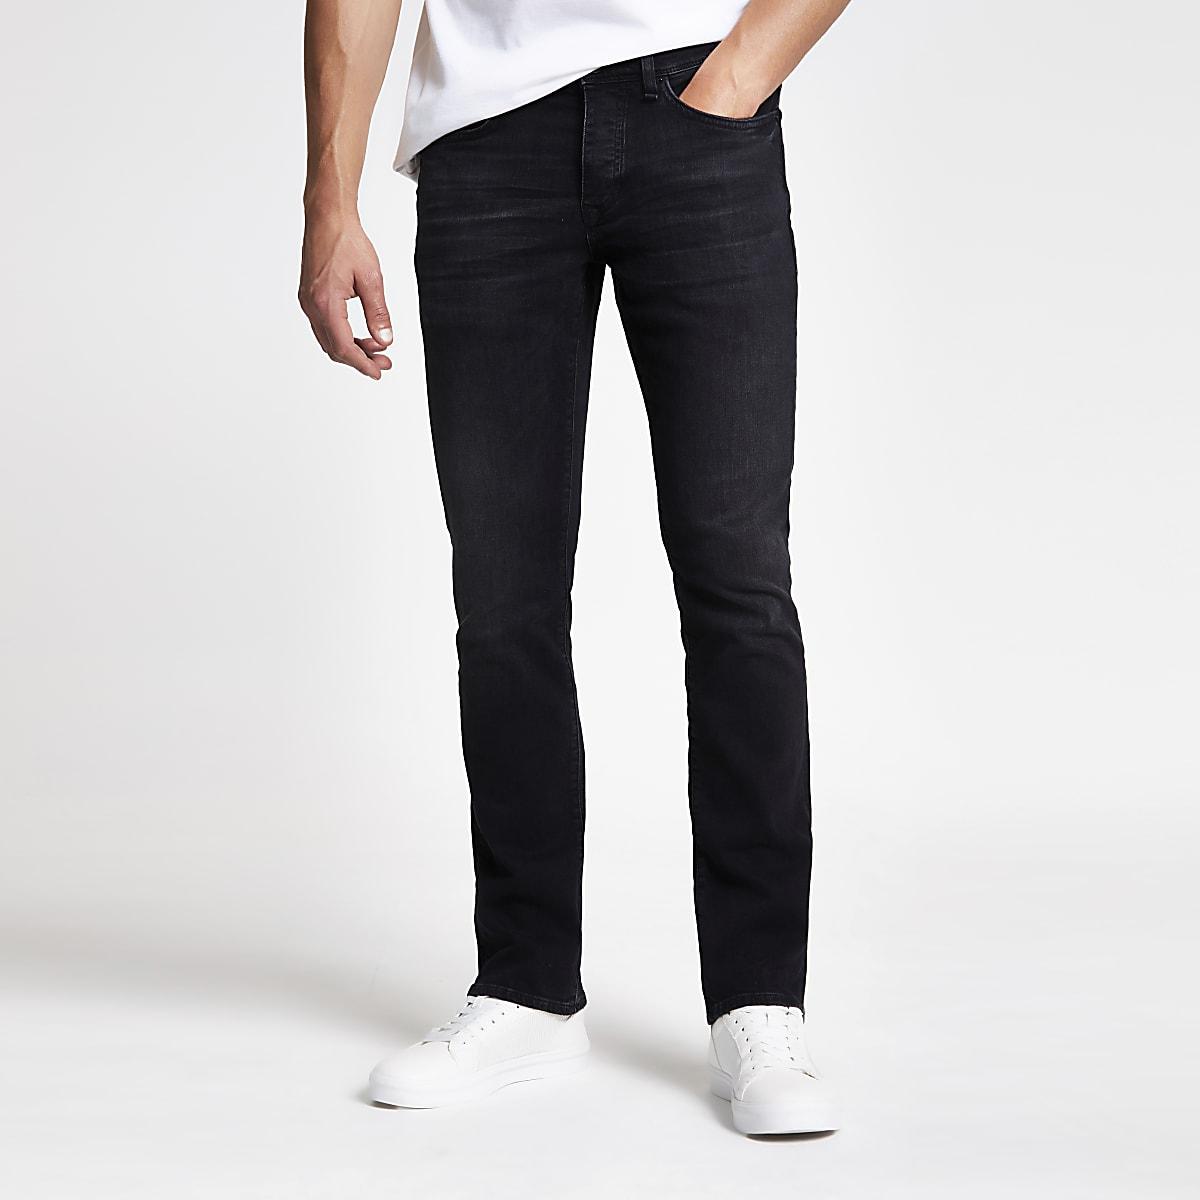 Black Clint bootcut stretch jeans